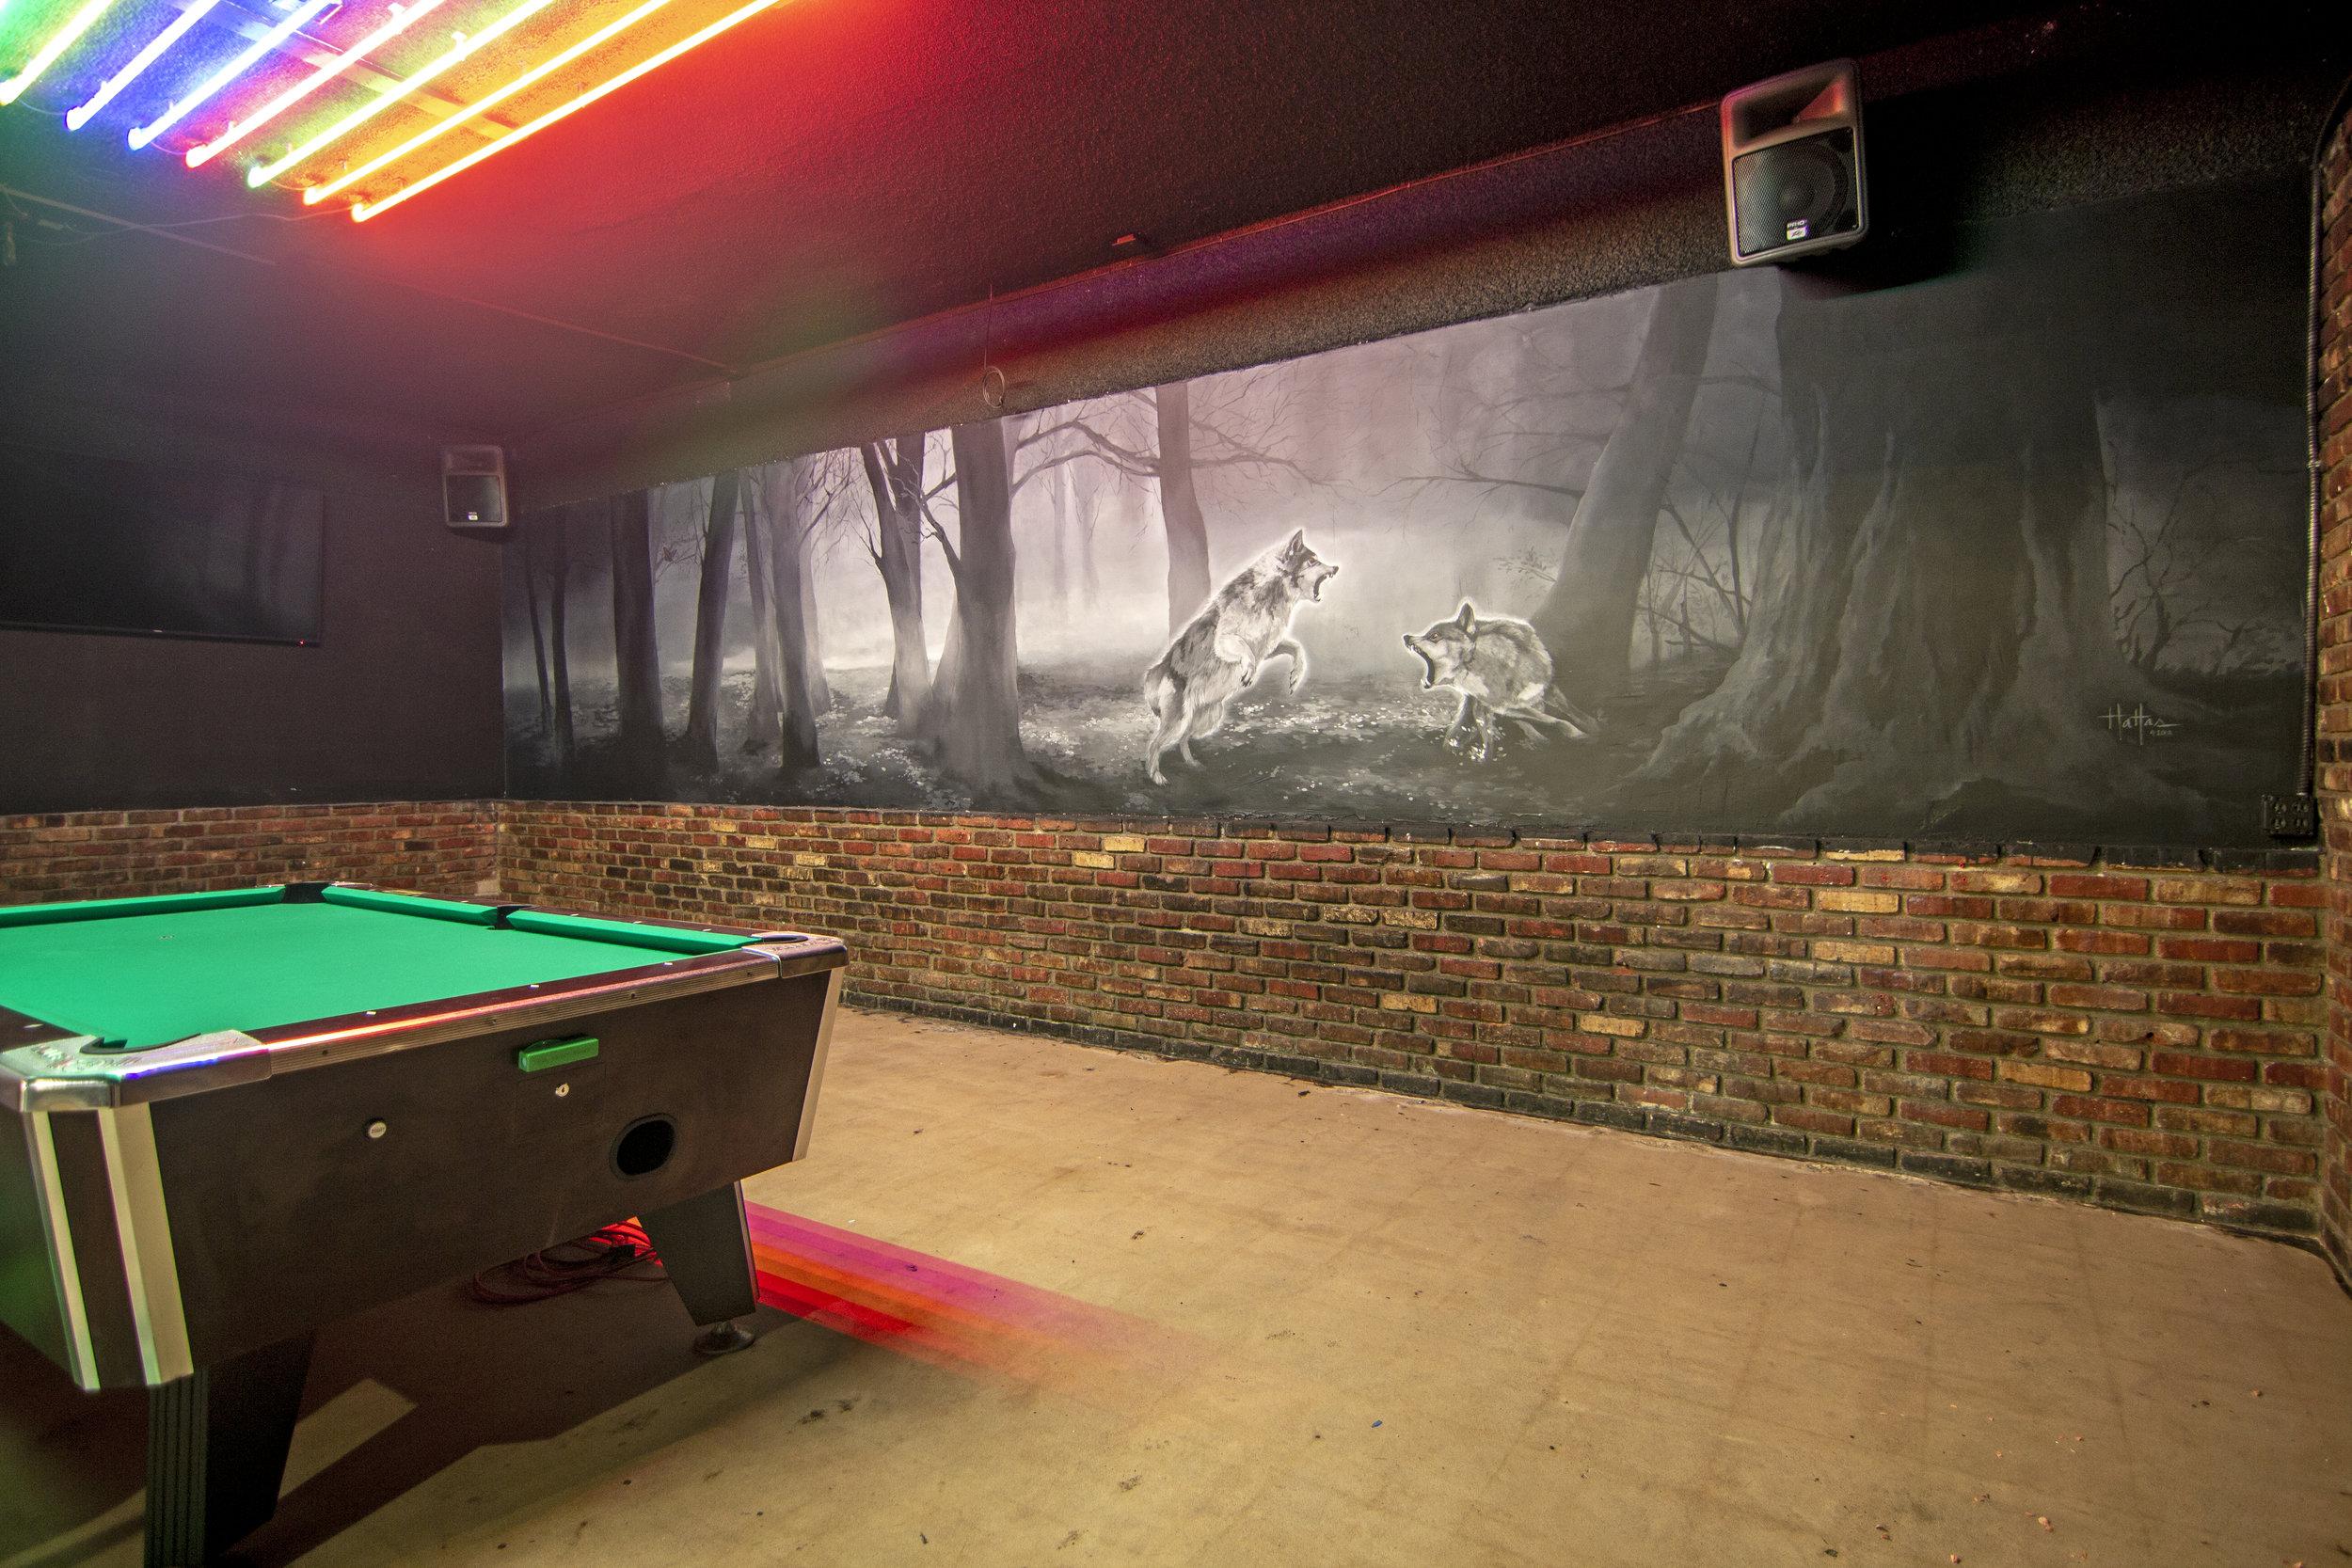 The Hound Bar, South Gate, CA